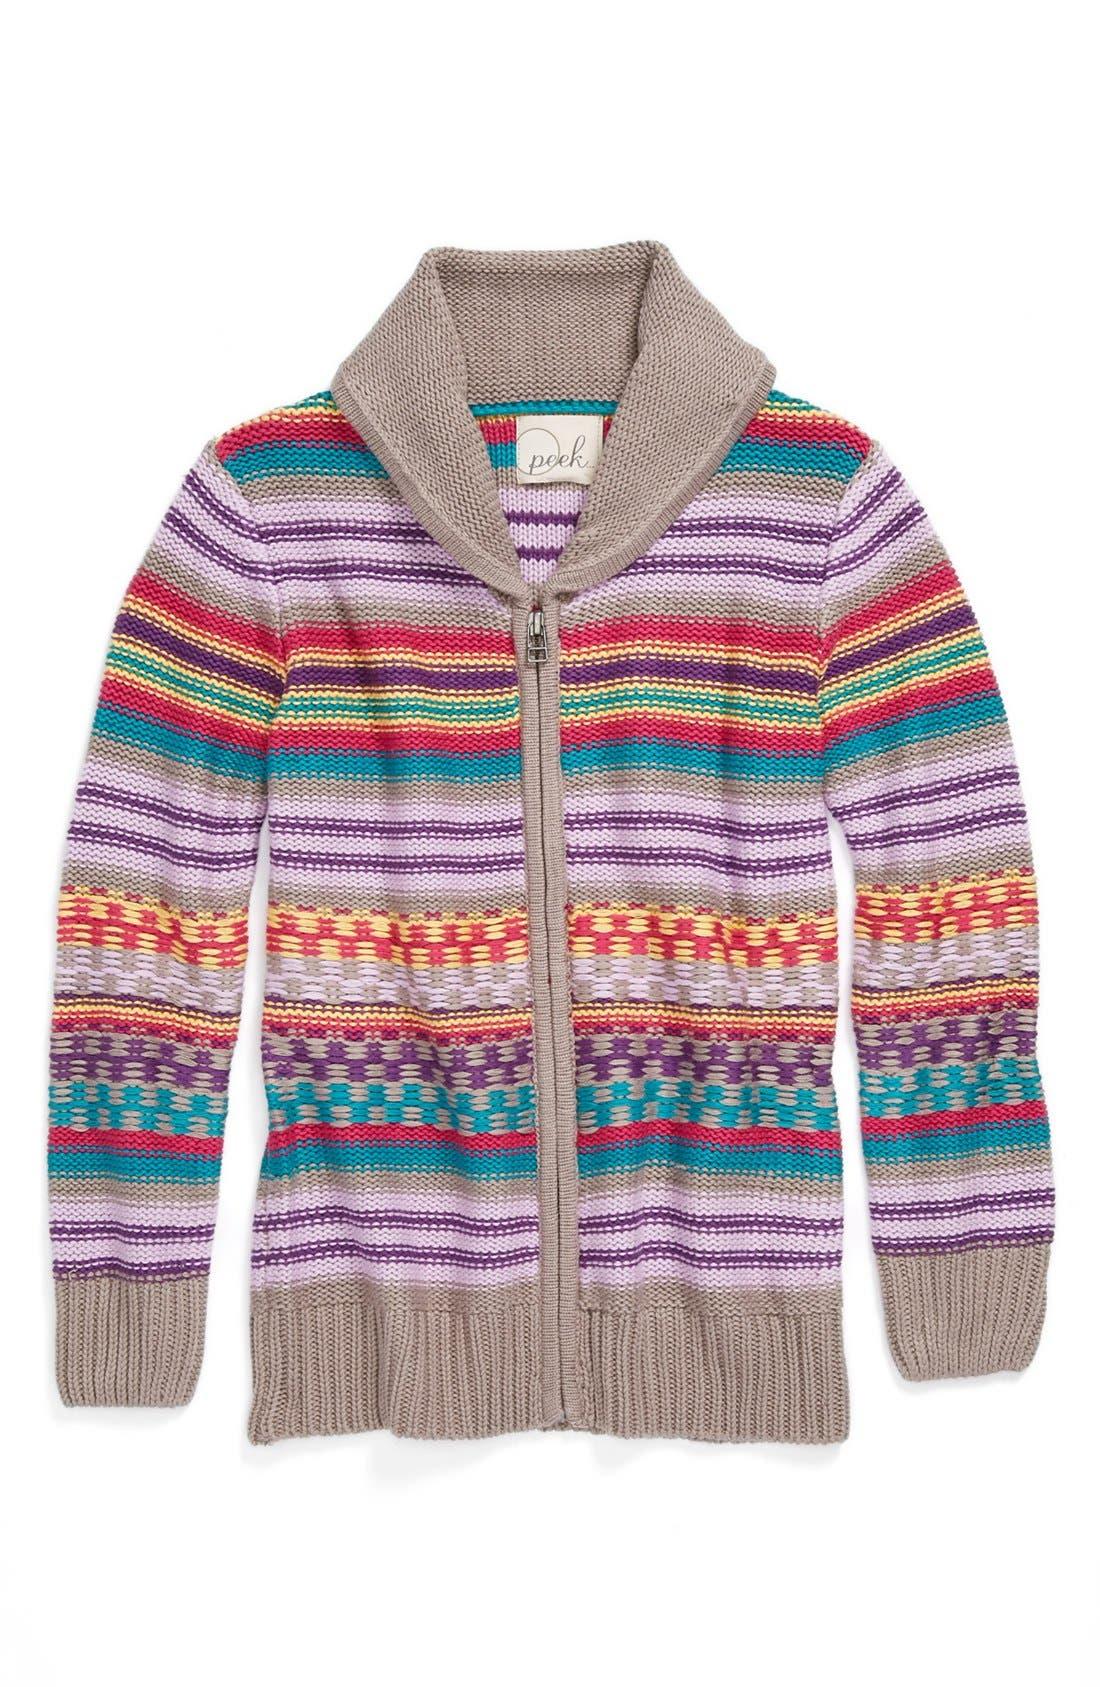 Main Image - Peek 'Festival' Sweater (Toddler Girls, Little Girls & Big Girls)